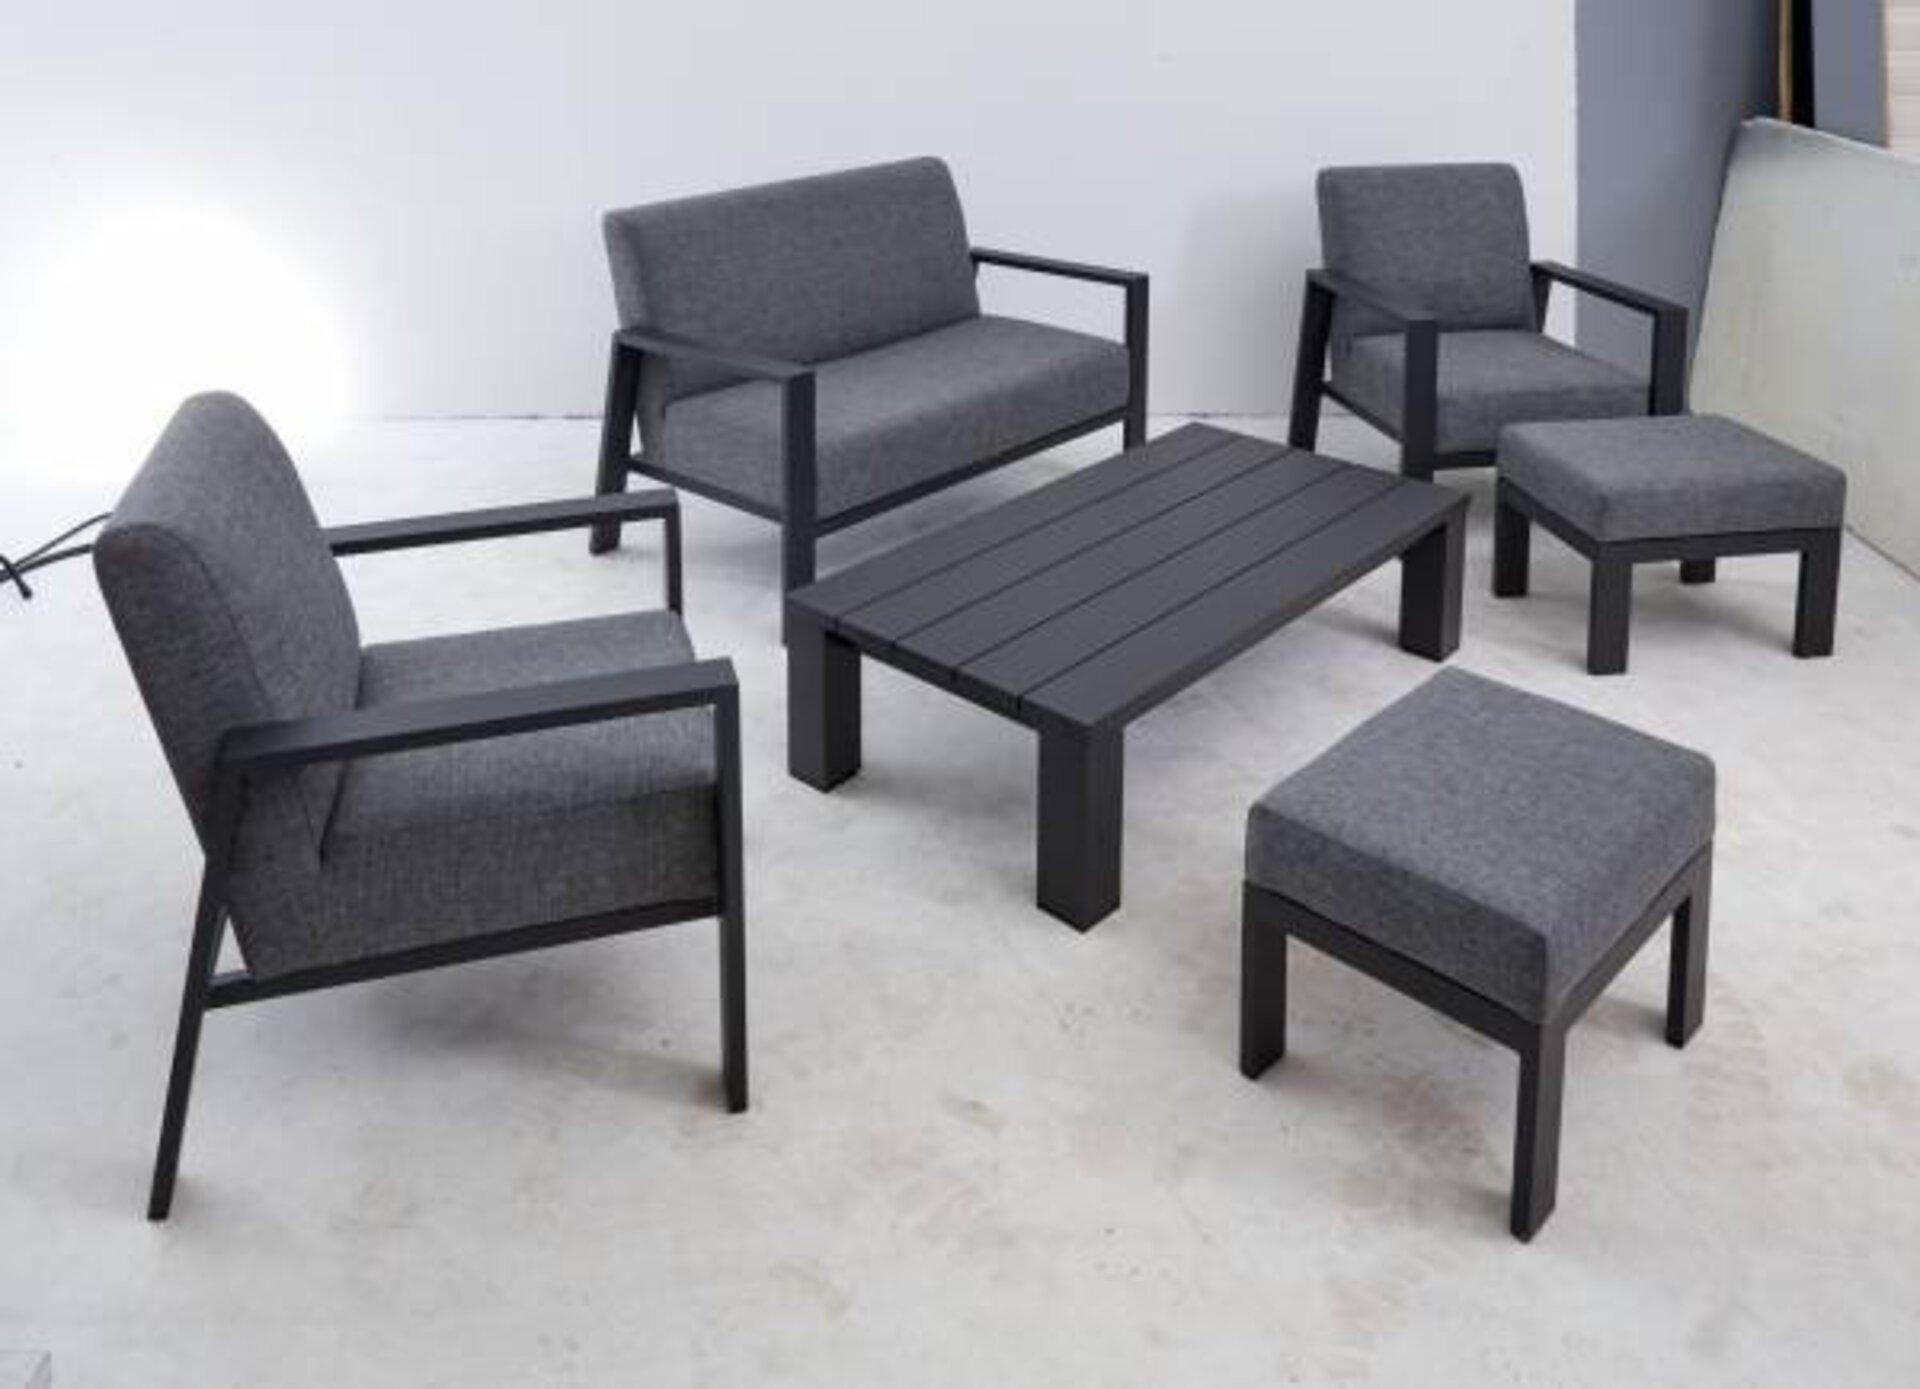 Loungehocker DJERBA Outdoor Textil grau 43 x 43 x 58 cm